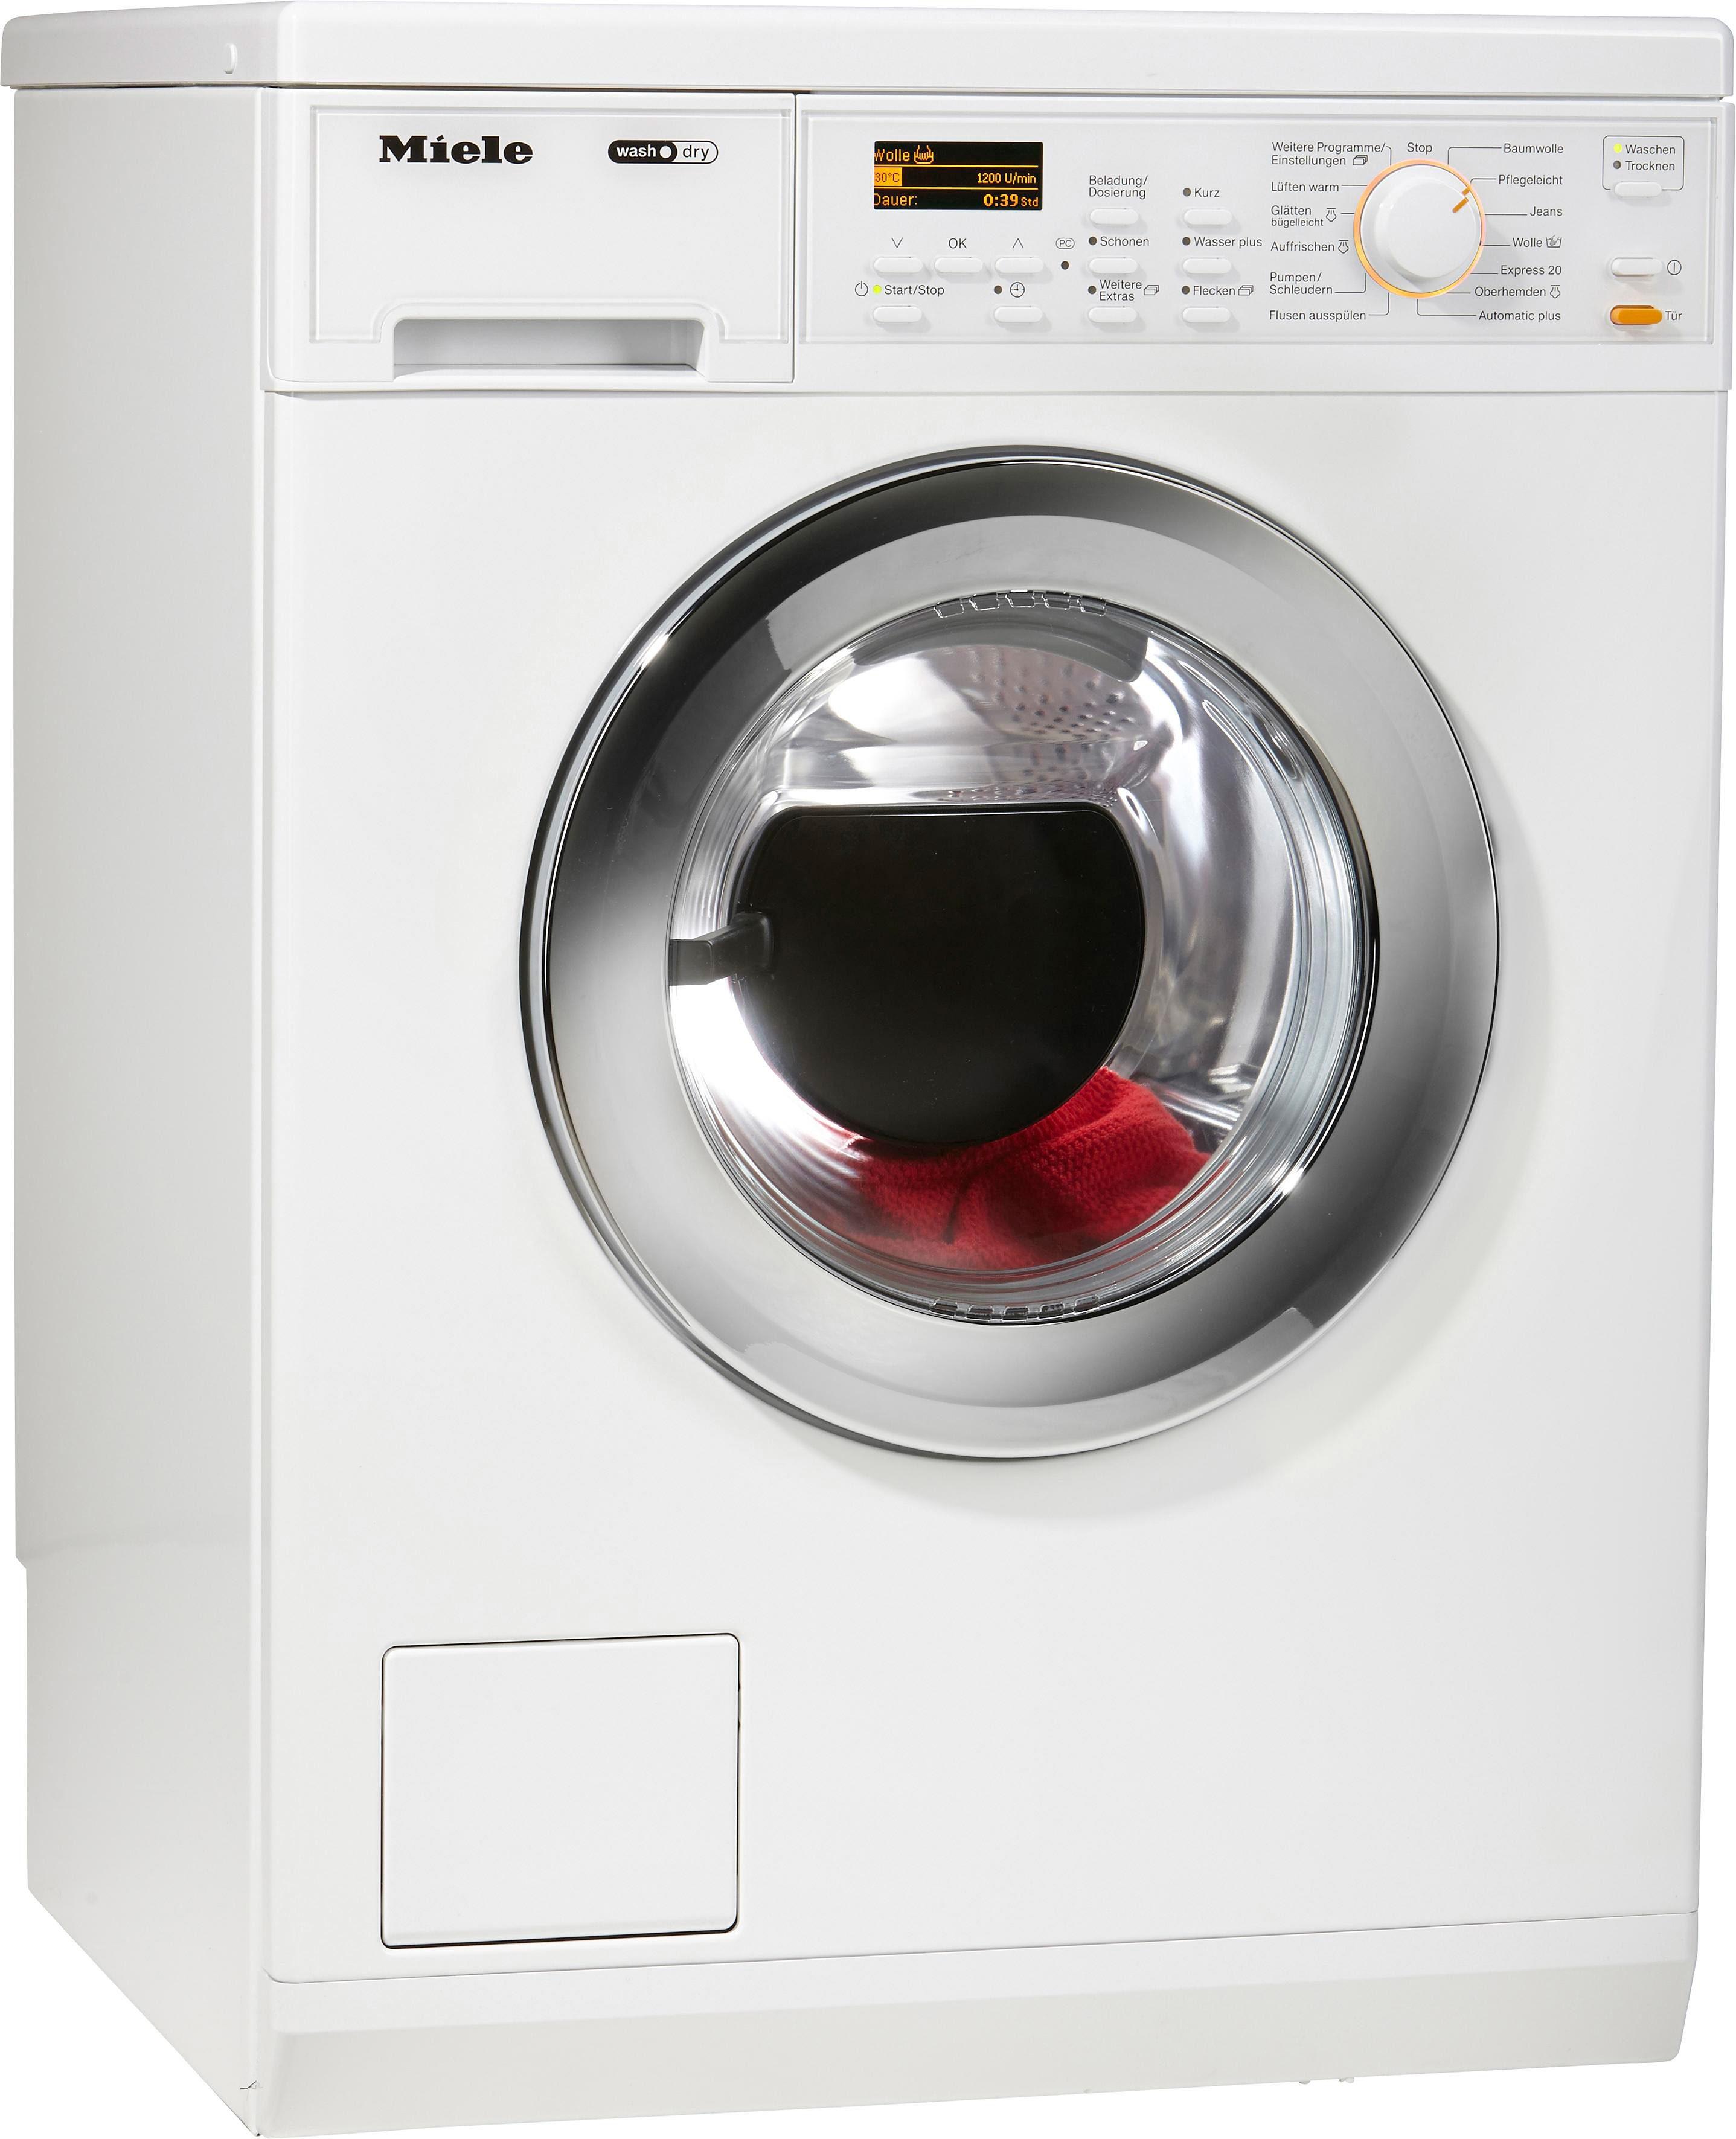 MIELE Waschtrockner WT 2796 WPM, A, 6 kg / 3 kg, 1600 U/Min